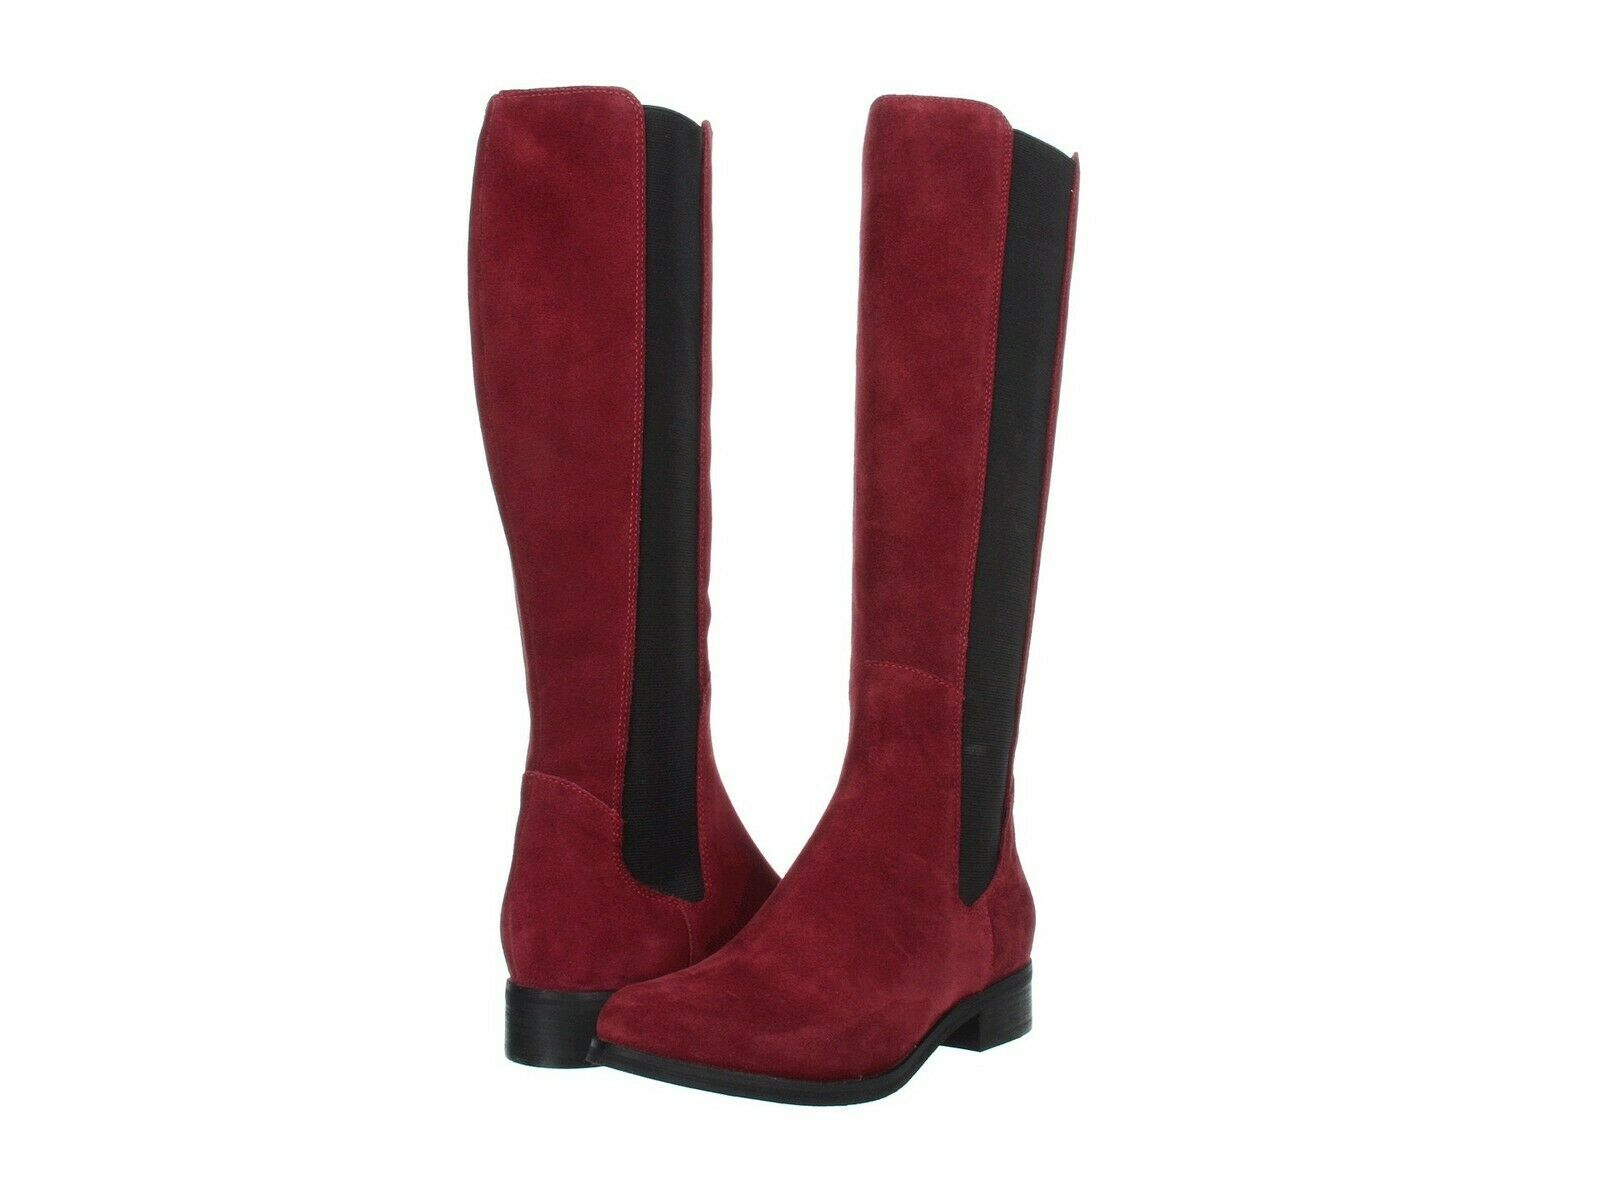 67% OFF NEW COLE HAAN Jodhpur Rich Oxblood Suede Knee-High Boots sz 5.5  Ret